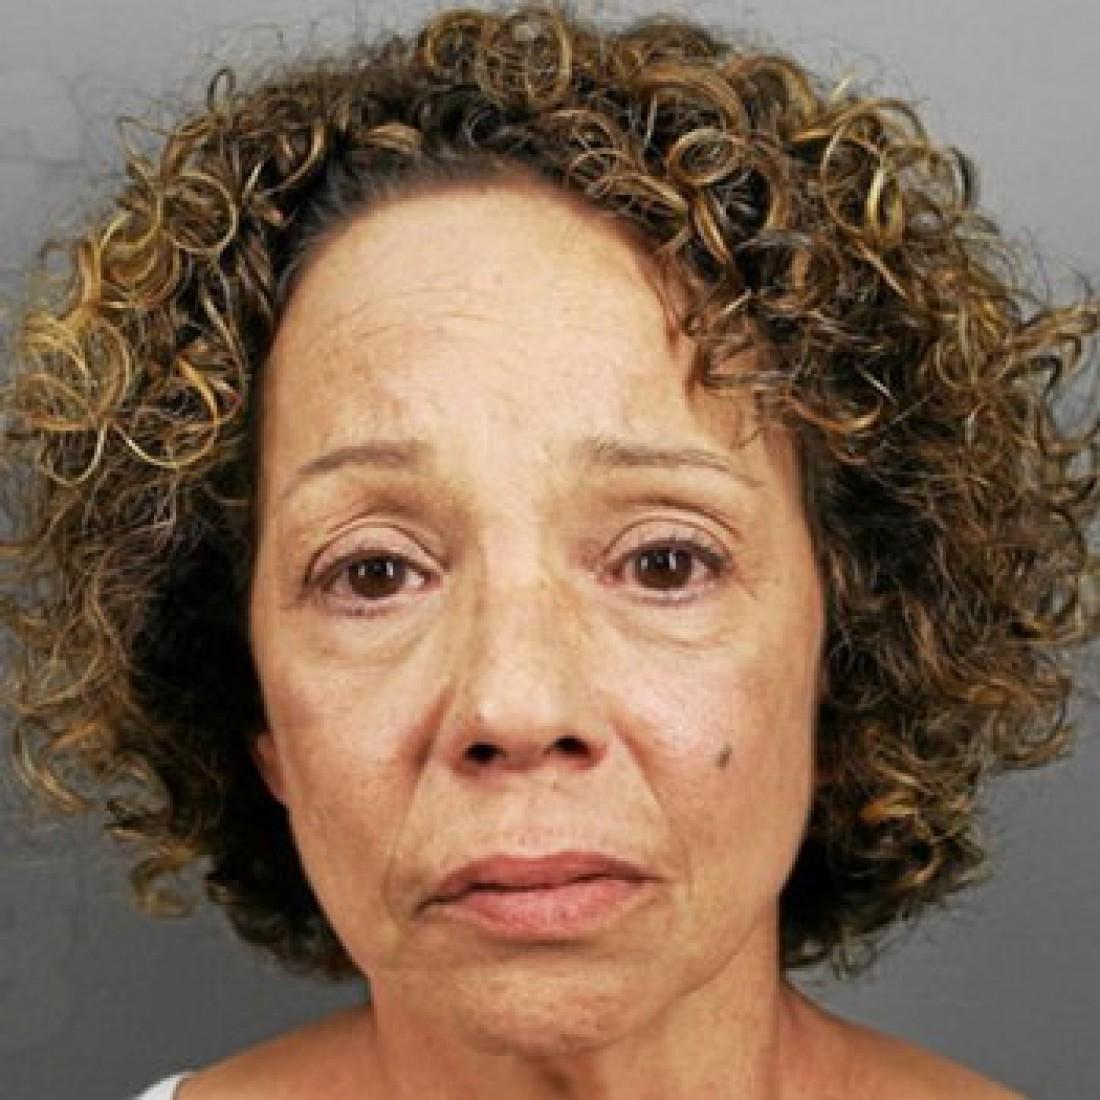 Умирающая отВИЧ сестра Мэрайи Кэри арестована запроституцию